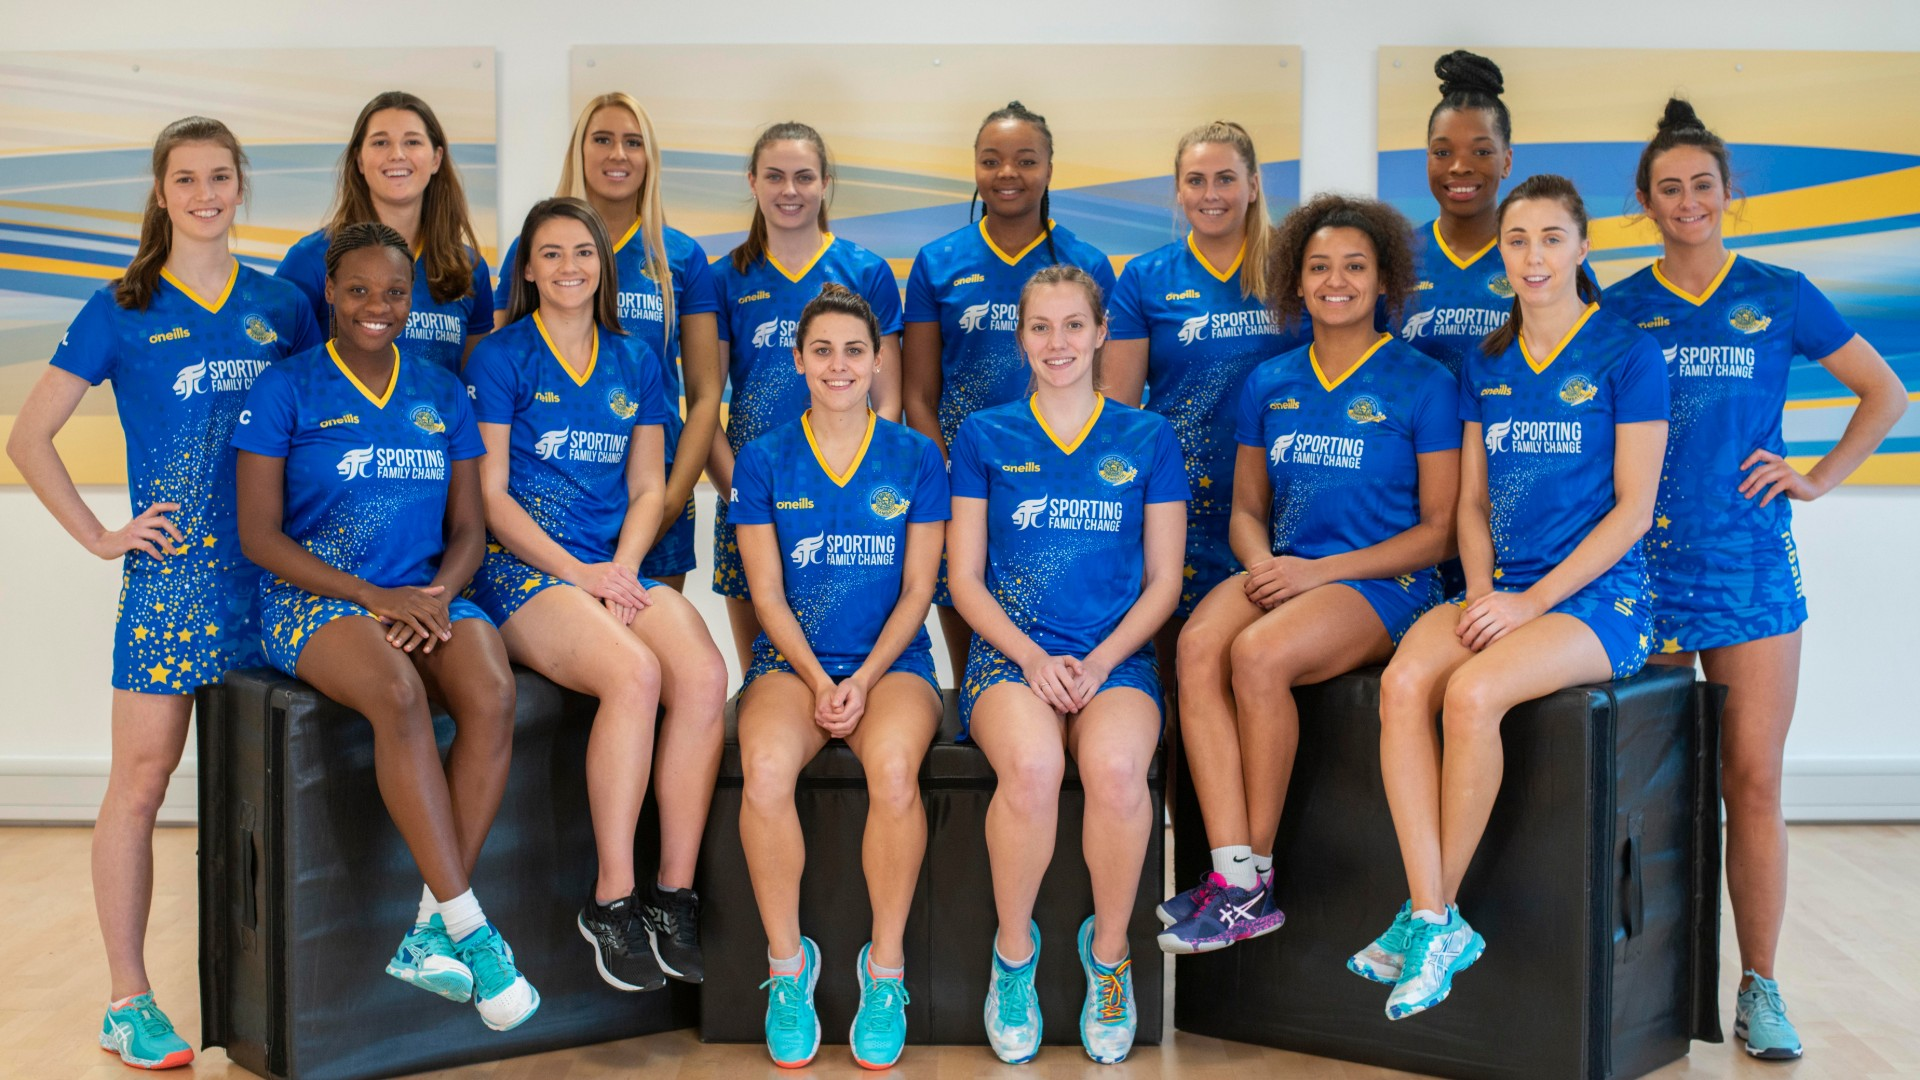 The Team Bath netball team